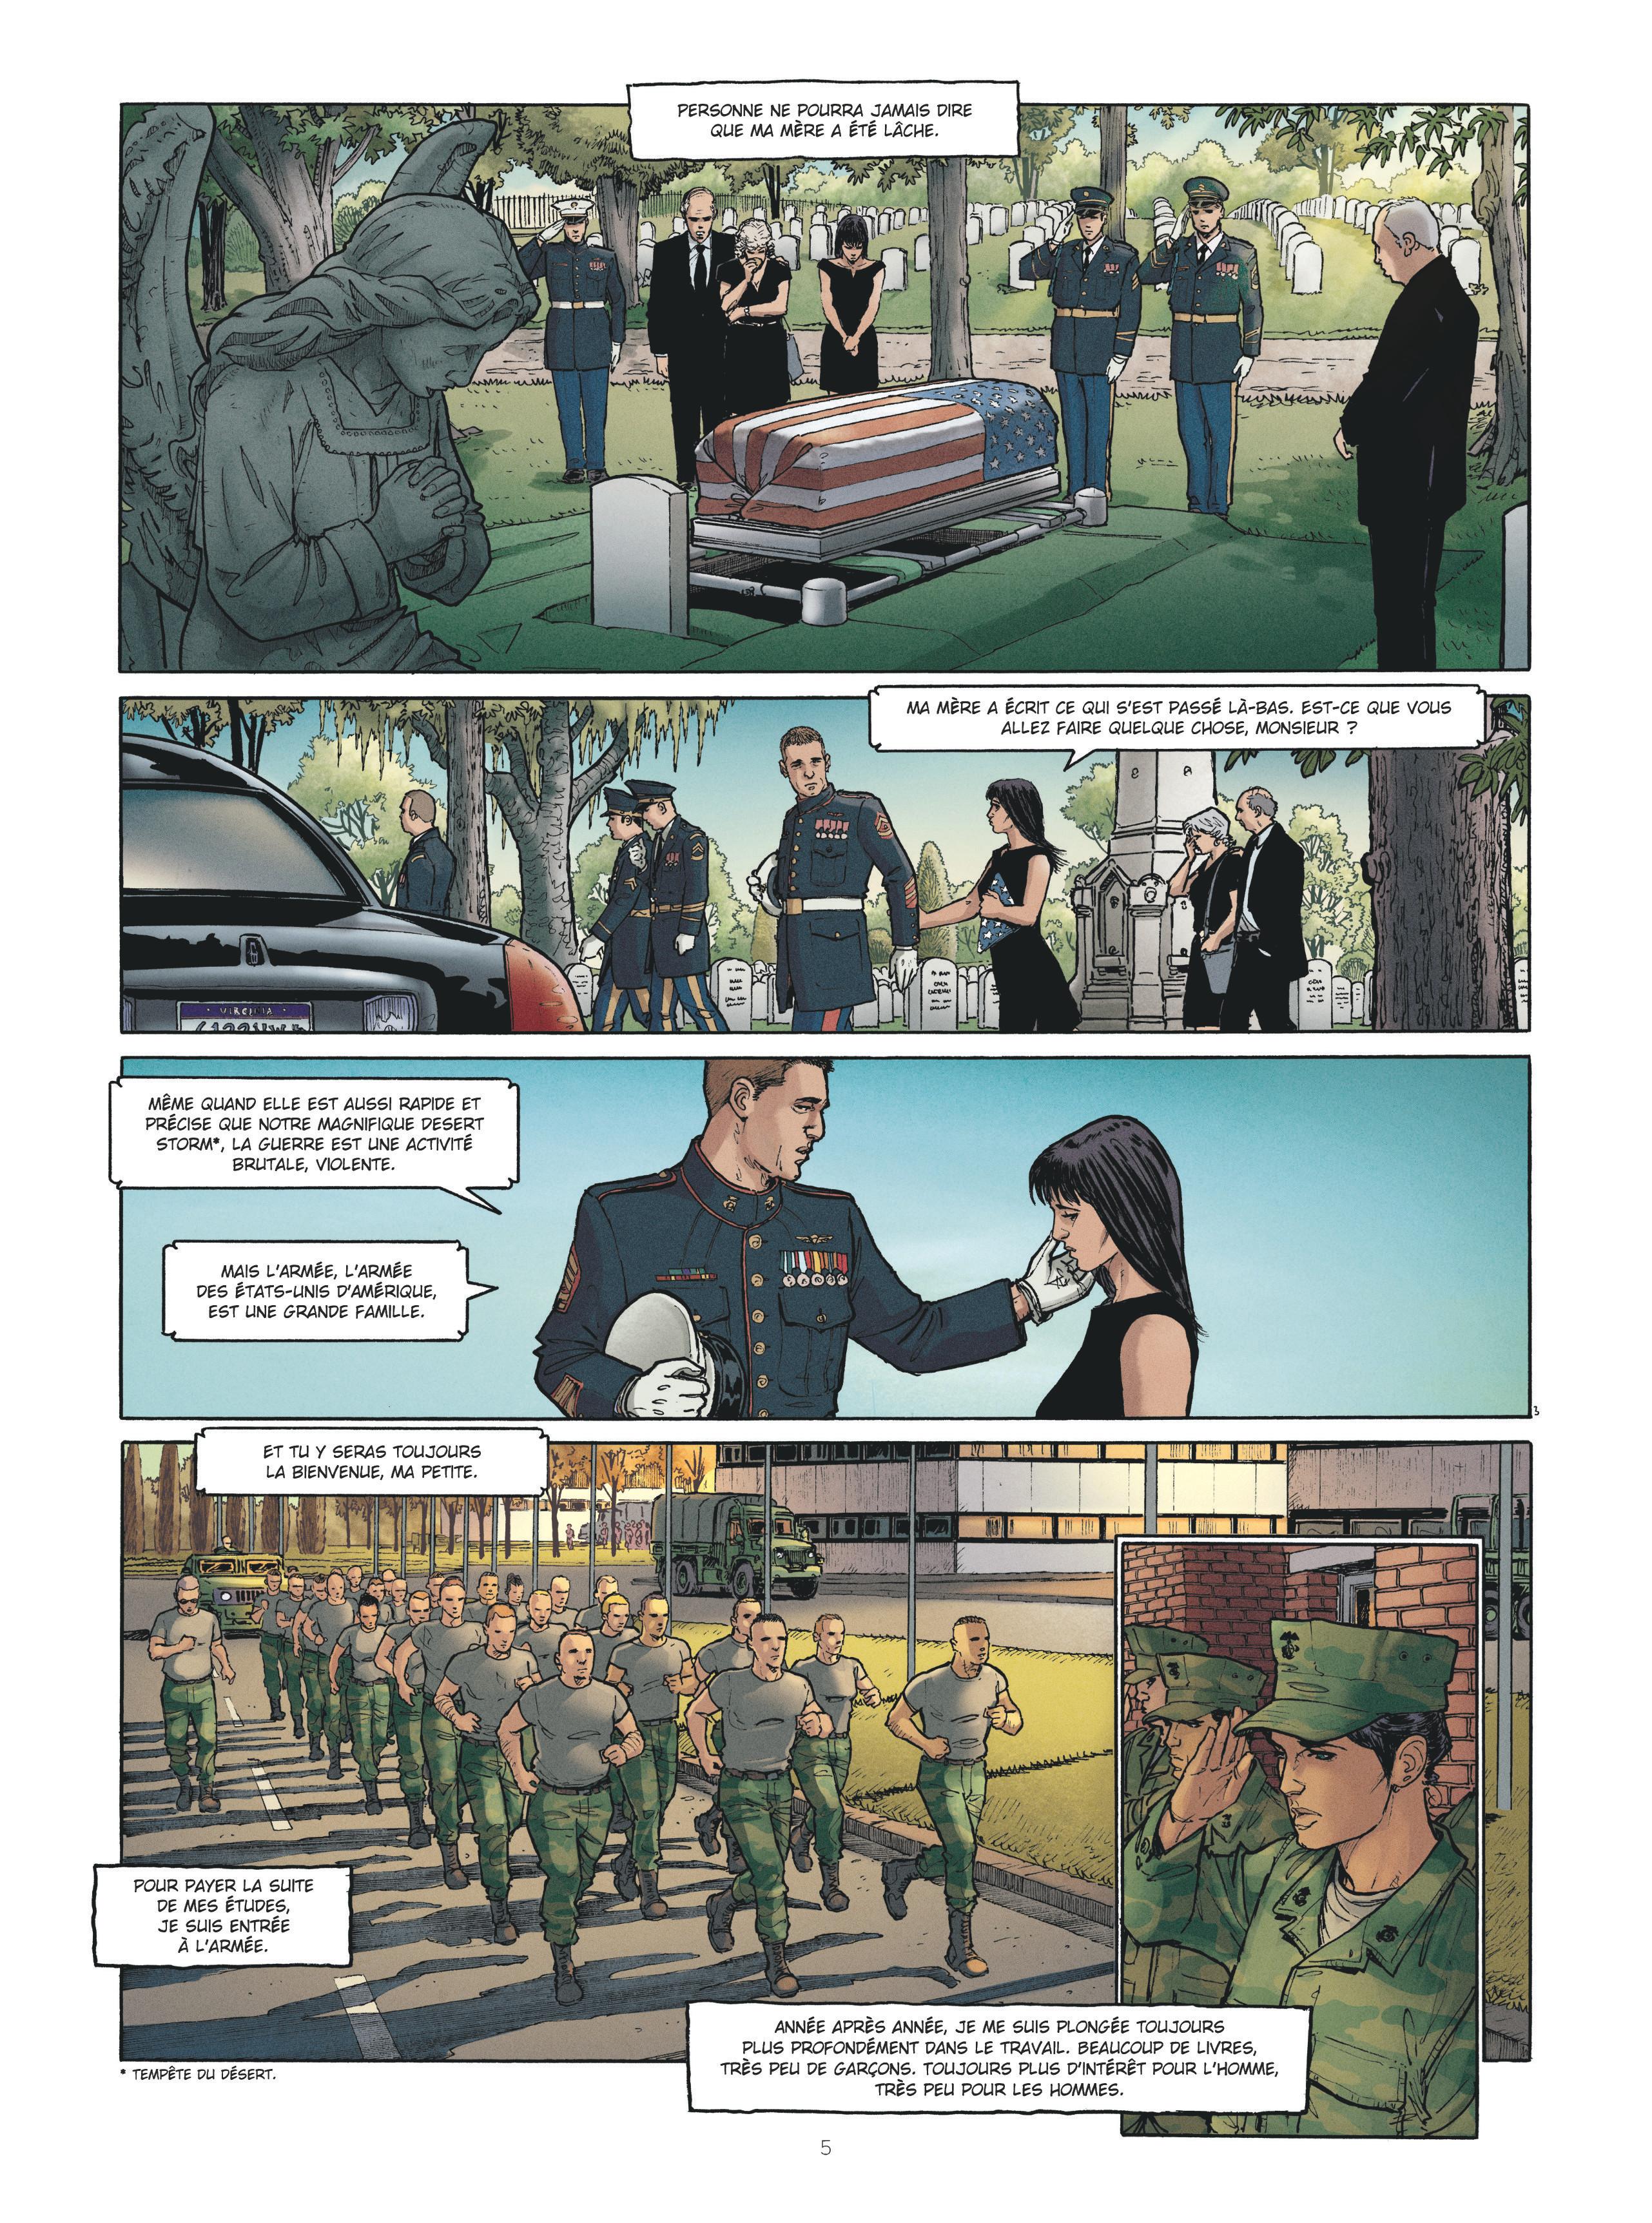 Bagdad_Inc_Page 5